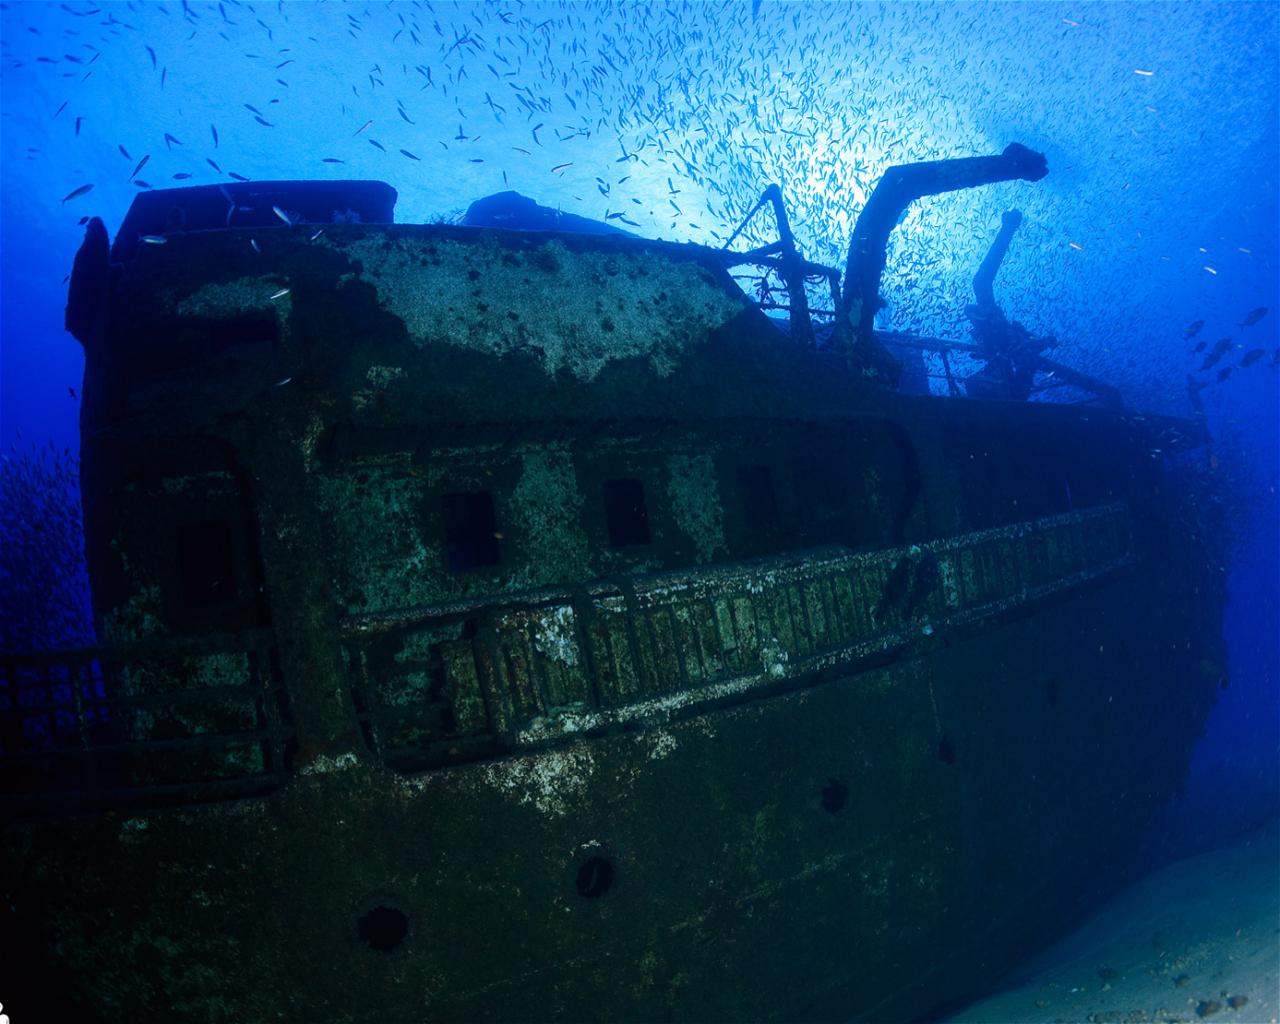 Madeirense (Wreck)